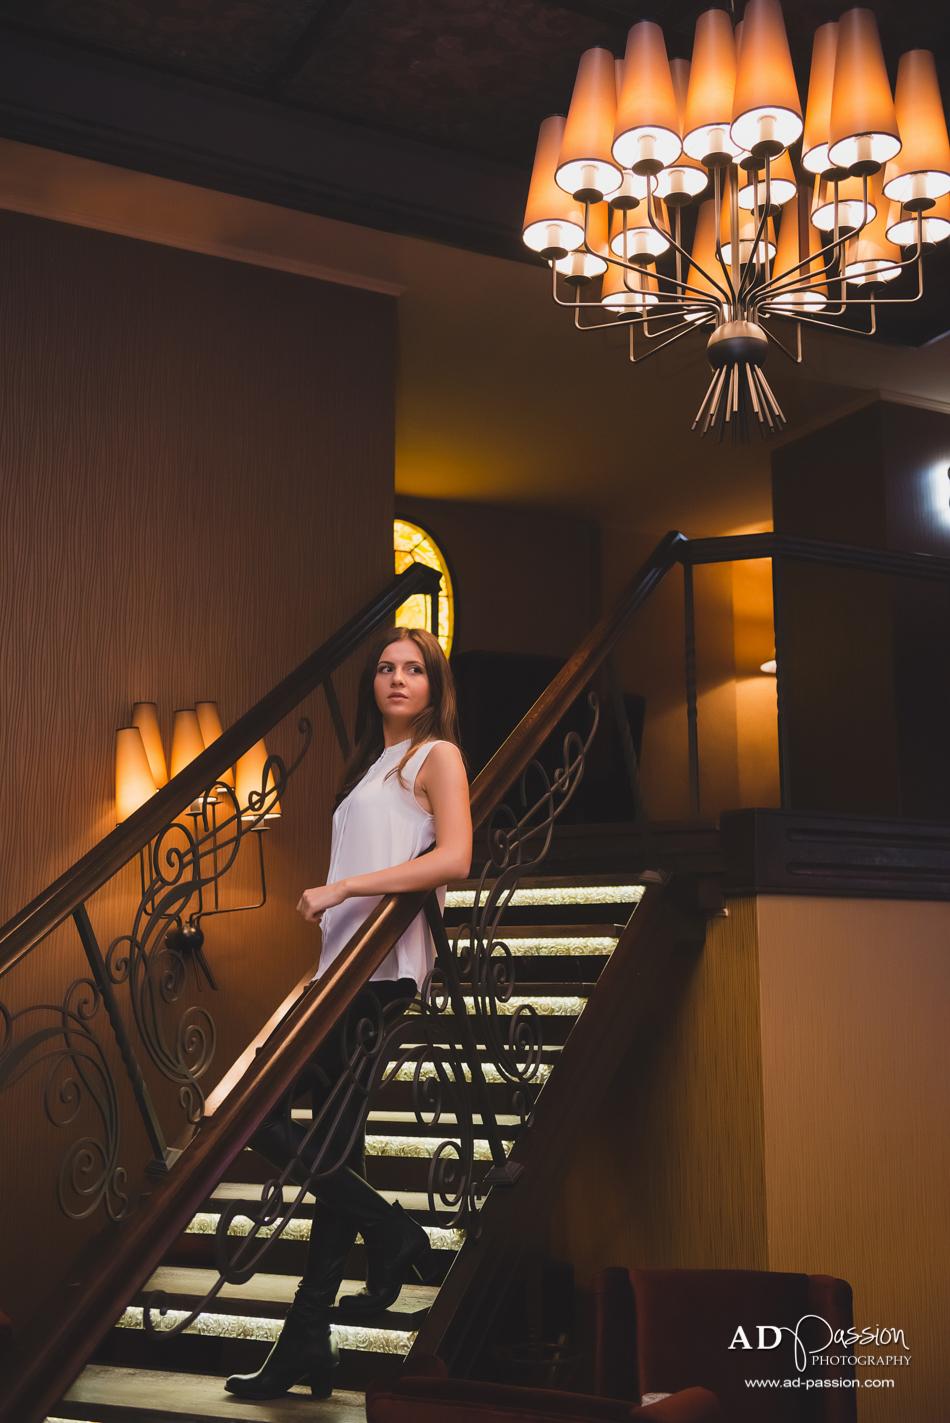 AD Passion Photography | rahela_fotografie-portret-timisoara_0030 | Adelin, Dida, fotograf profesionist, fotograf de nunta, fotografie de nunta, fotograf Timisoara, fotograf Craiova, fotograf Bucuresti, fotograf Arad, nunta Timisoara, nunta Arad, nunta Bucuresti, nunta Craiova